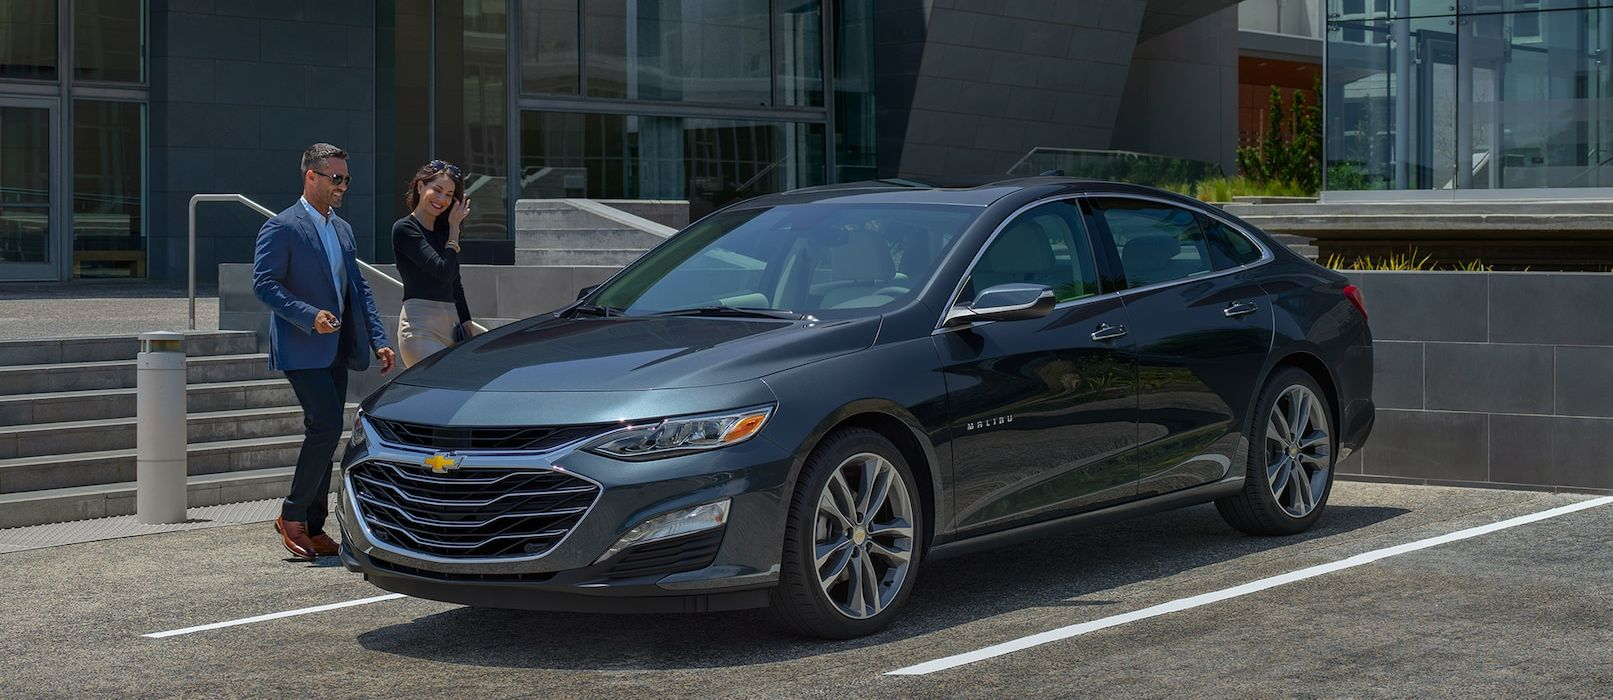 2019 Chevrolet Malibu for Sale near Lapeer, MI